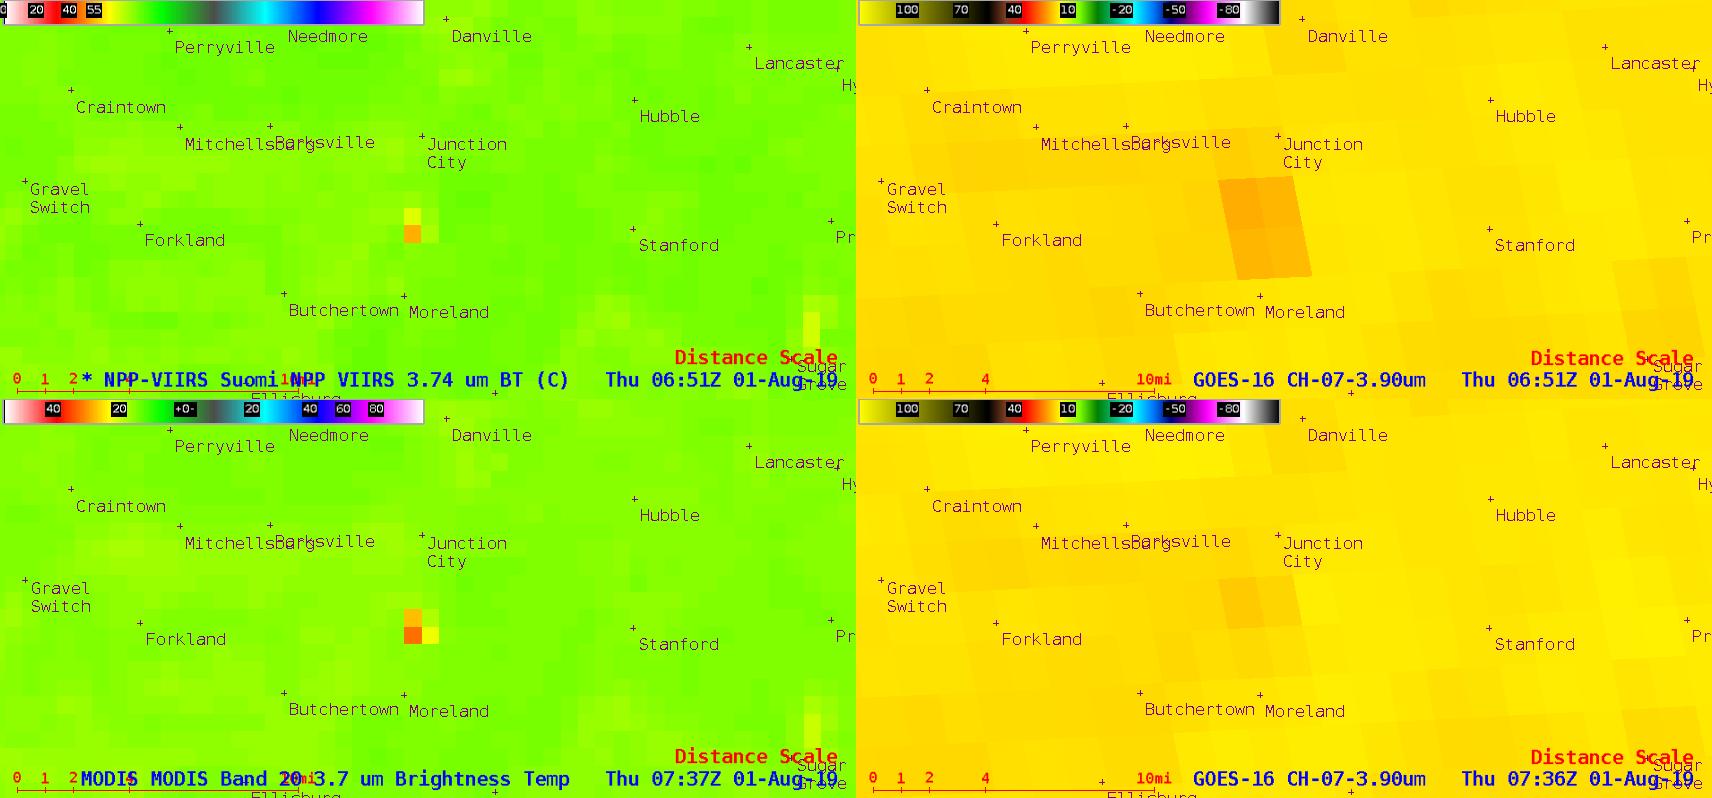 Suomi NPP VIIRS Shortwave Infrared (3.74 µm, top left), GOES-16 Shortwave Infrared (3.9 µm, top right), Aqua MODIS Shortwave Infrared (3.7 µm, bottom left) and GOES-16 Shortwave Infrared (3.9 µm, bottom right) images [click to enlarge]